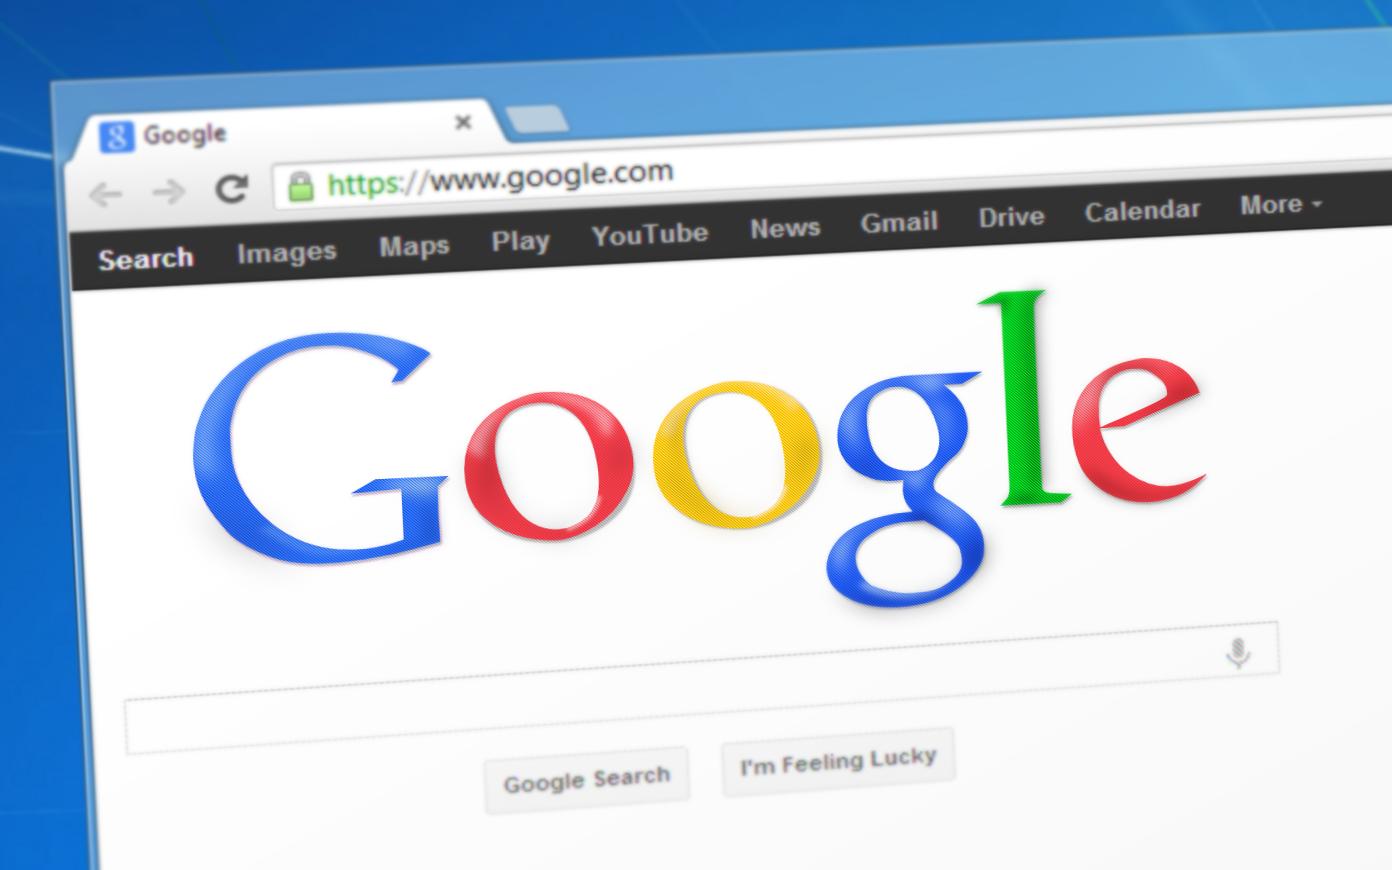 google 76517 - wordpressのパーマリンク設定でSEO対策におすすめの方法